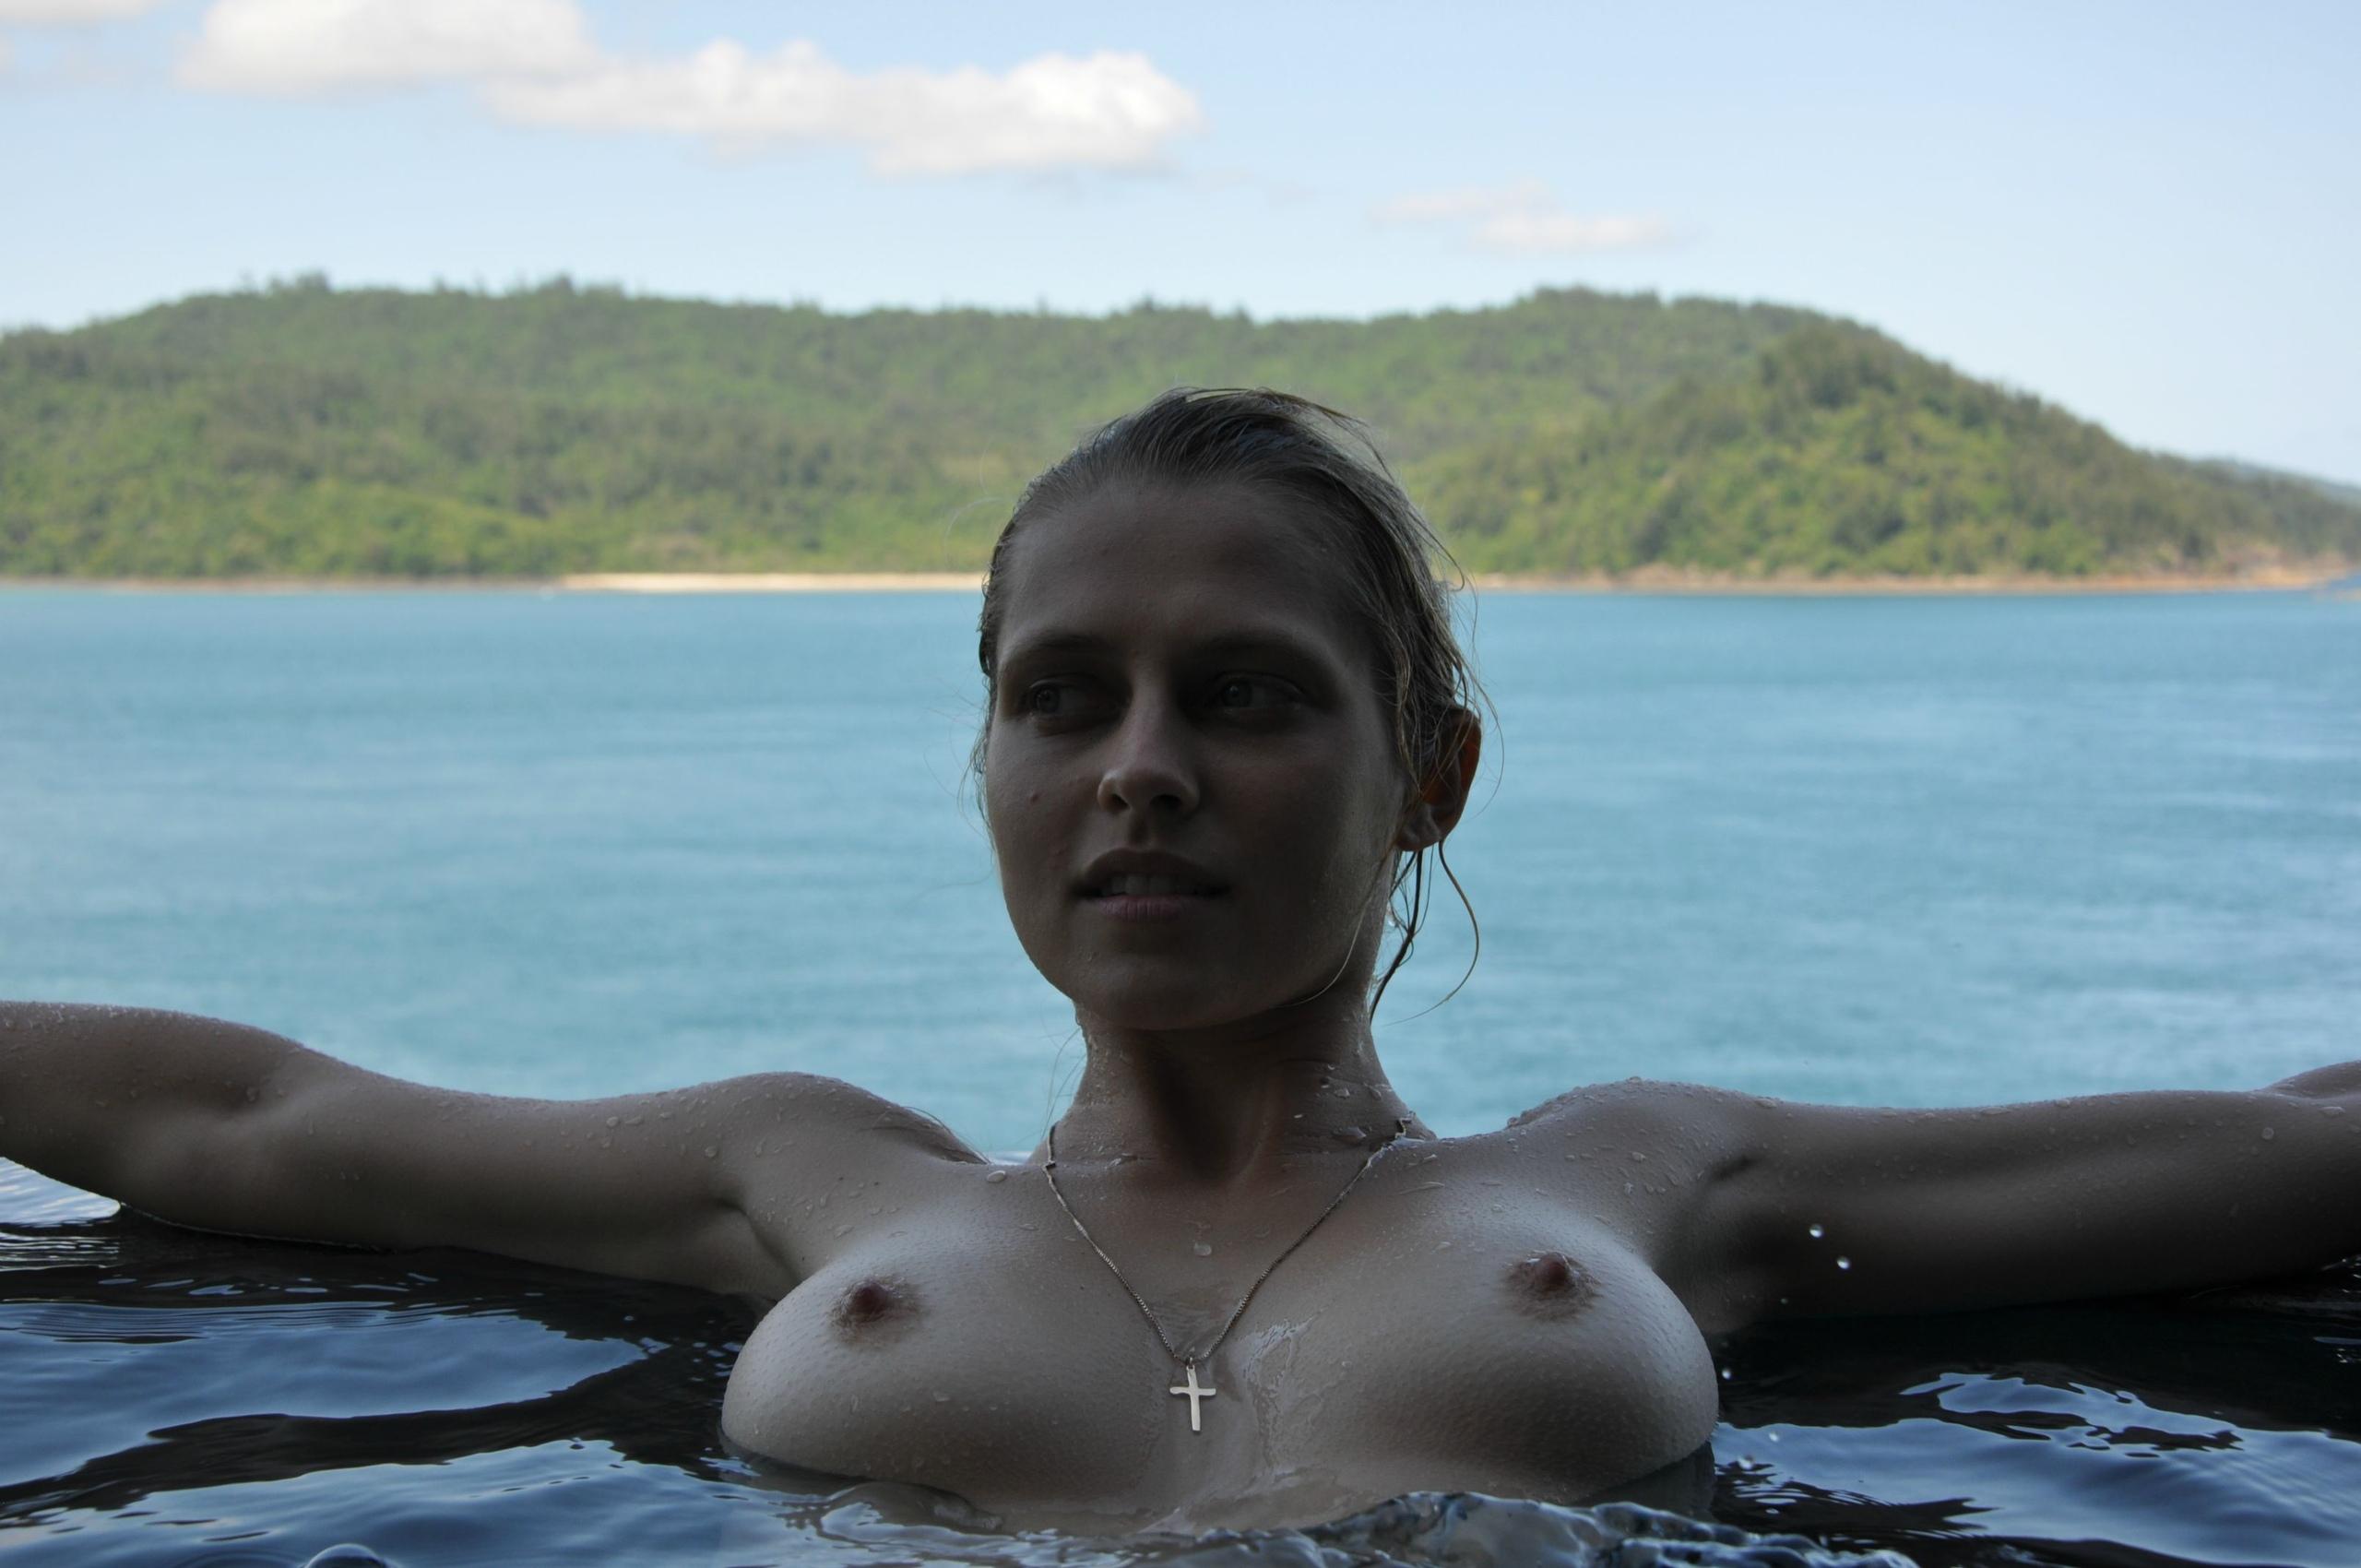 Teresa palmer hot nude